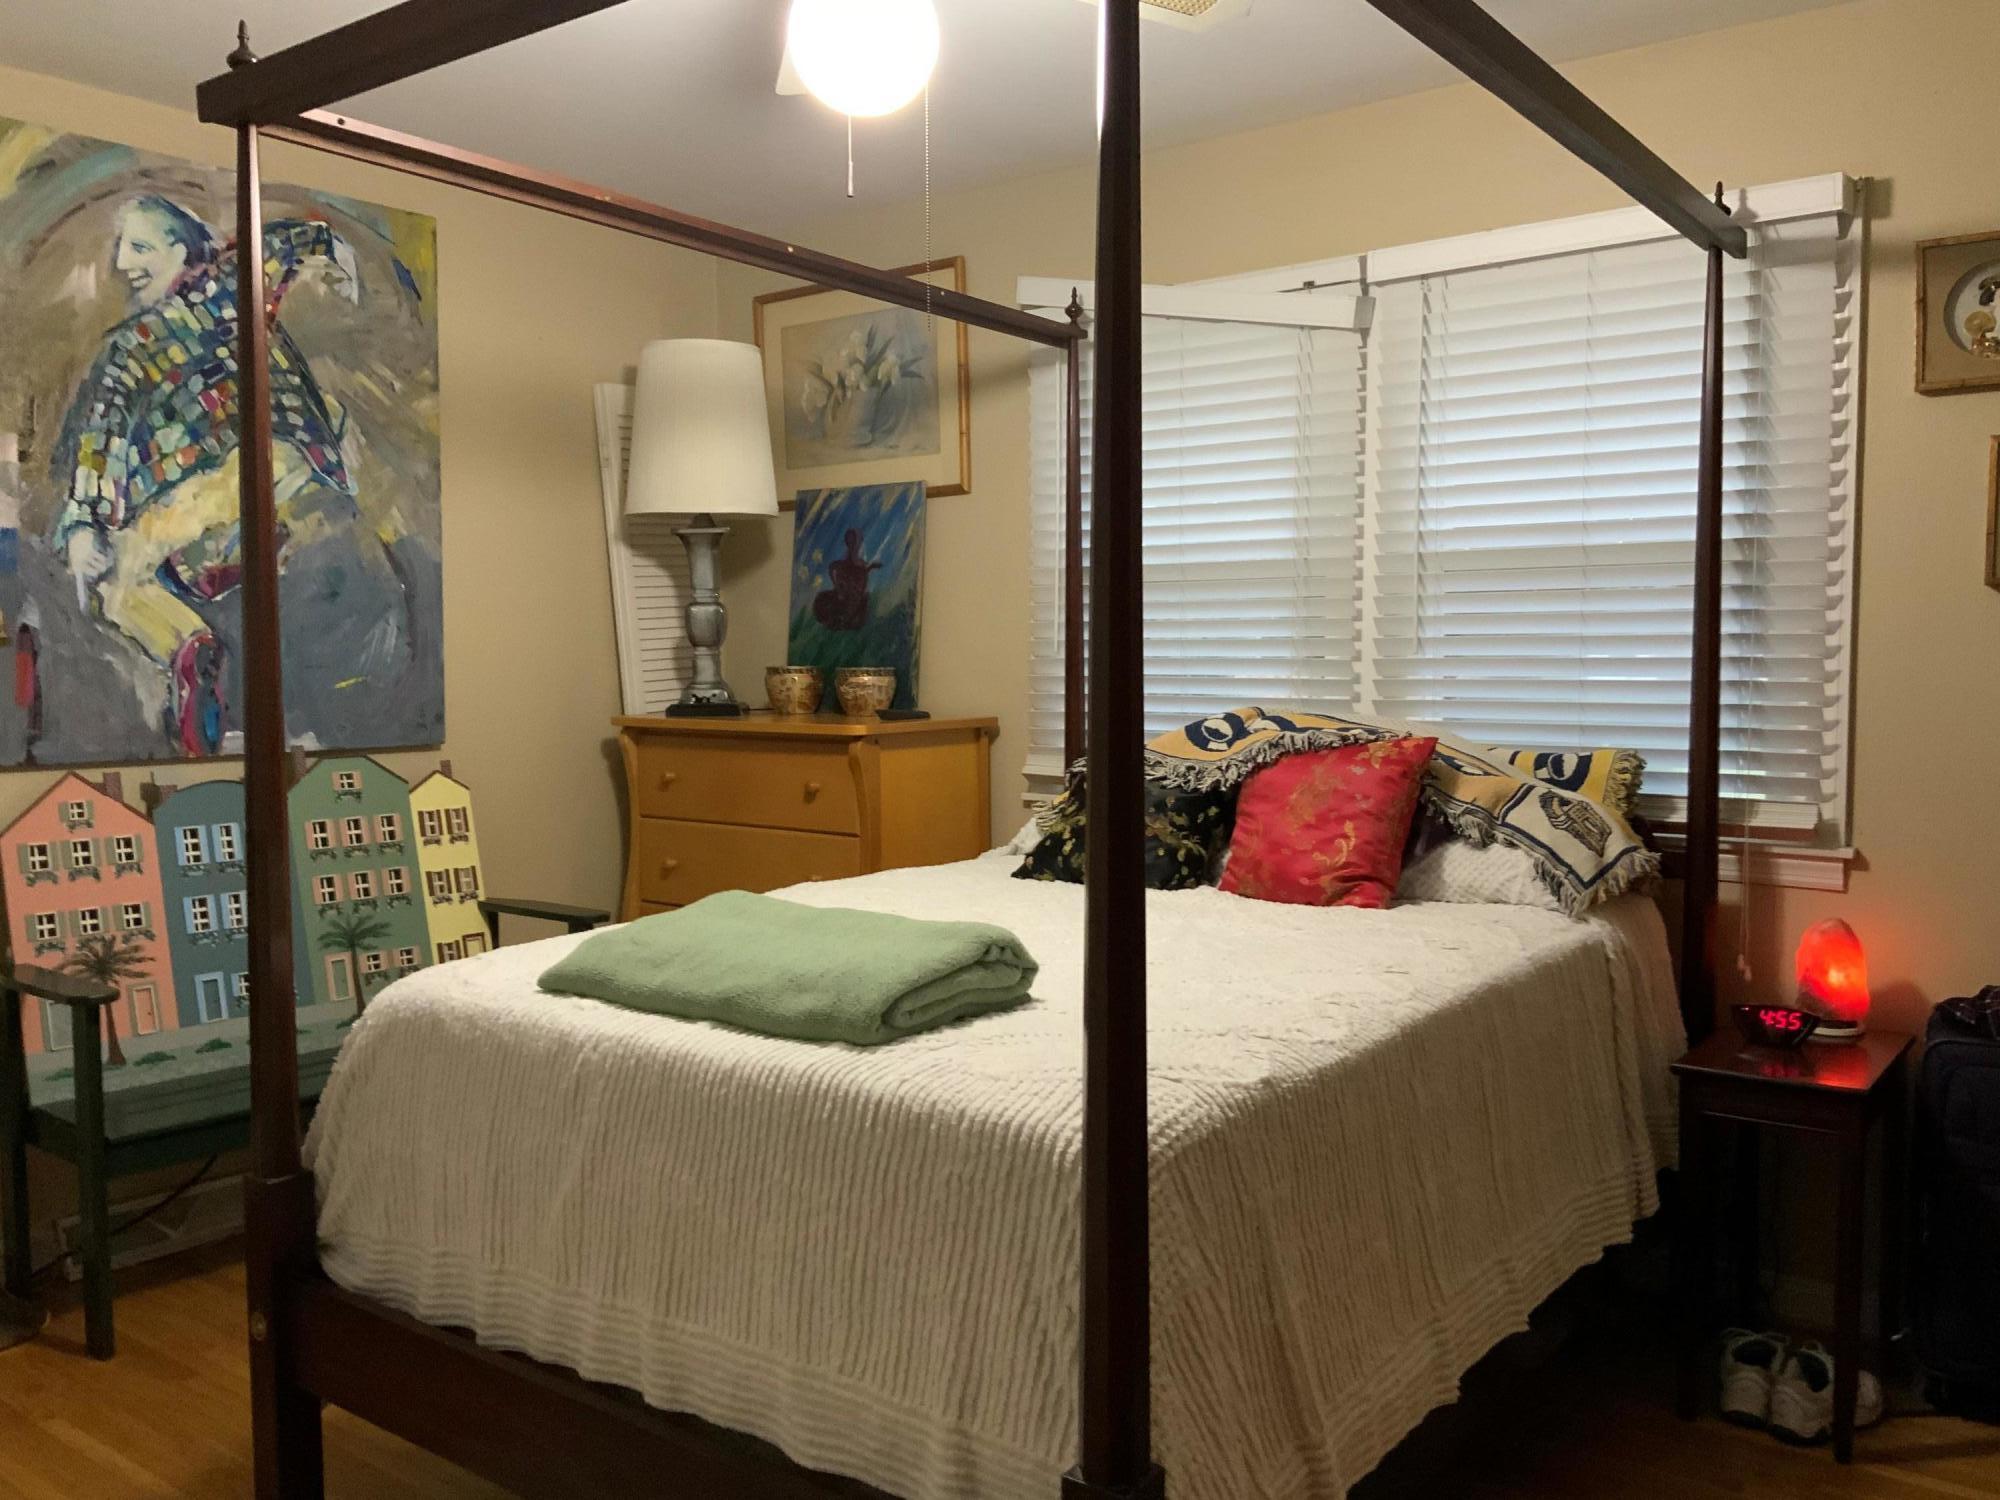 Northbridge Terrace Homes For Sale - 1156 Northbridge, Charleston, SC - 14